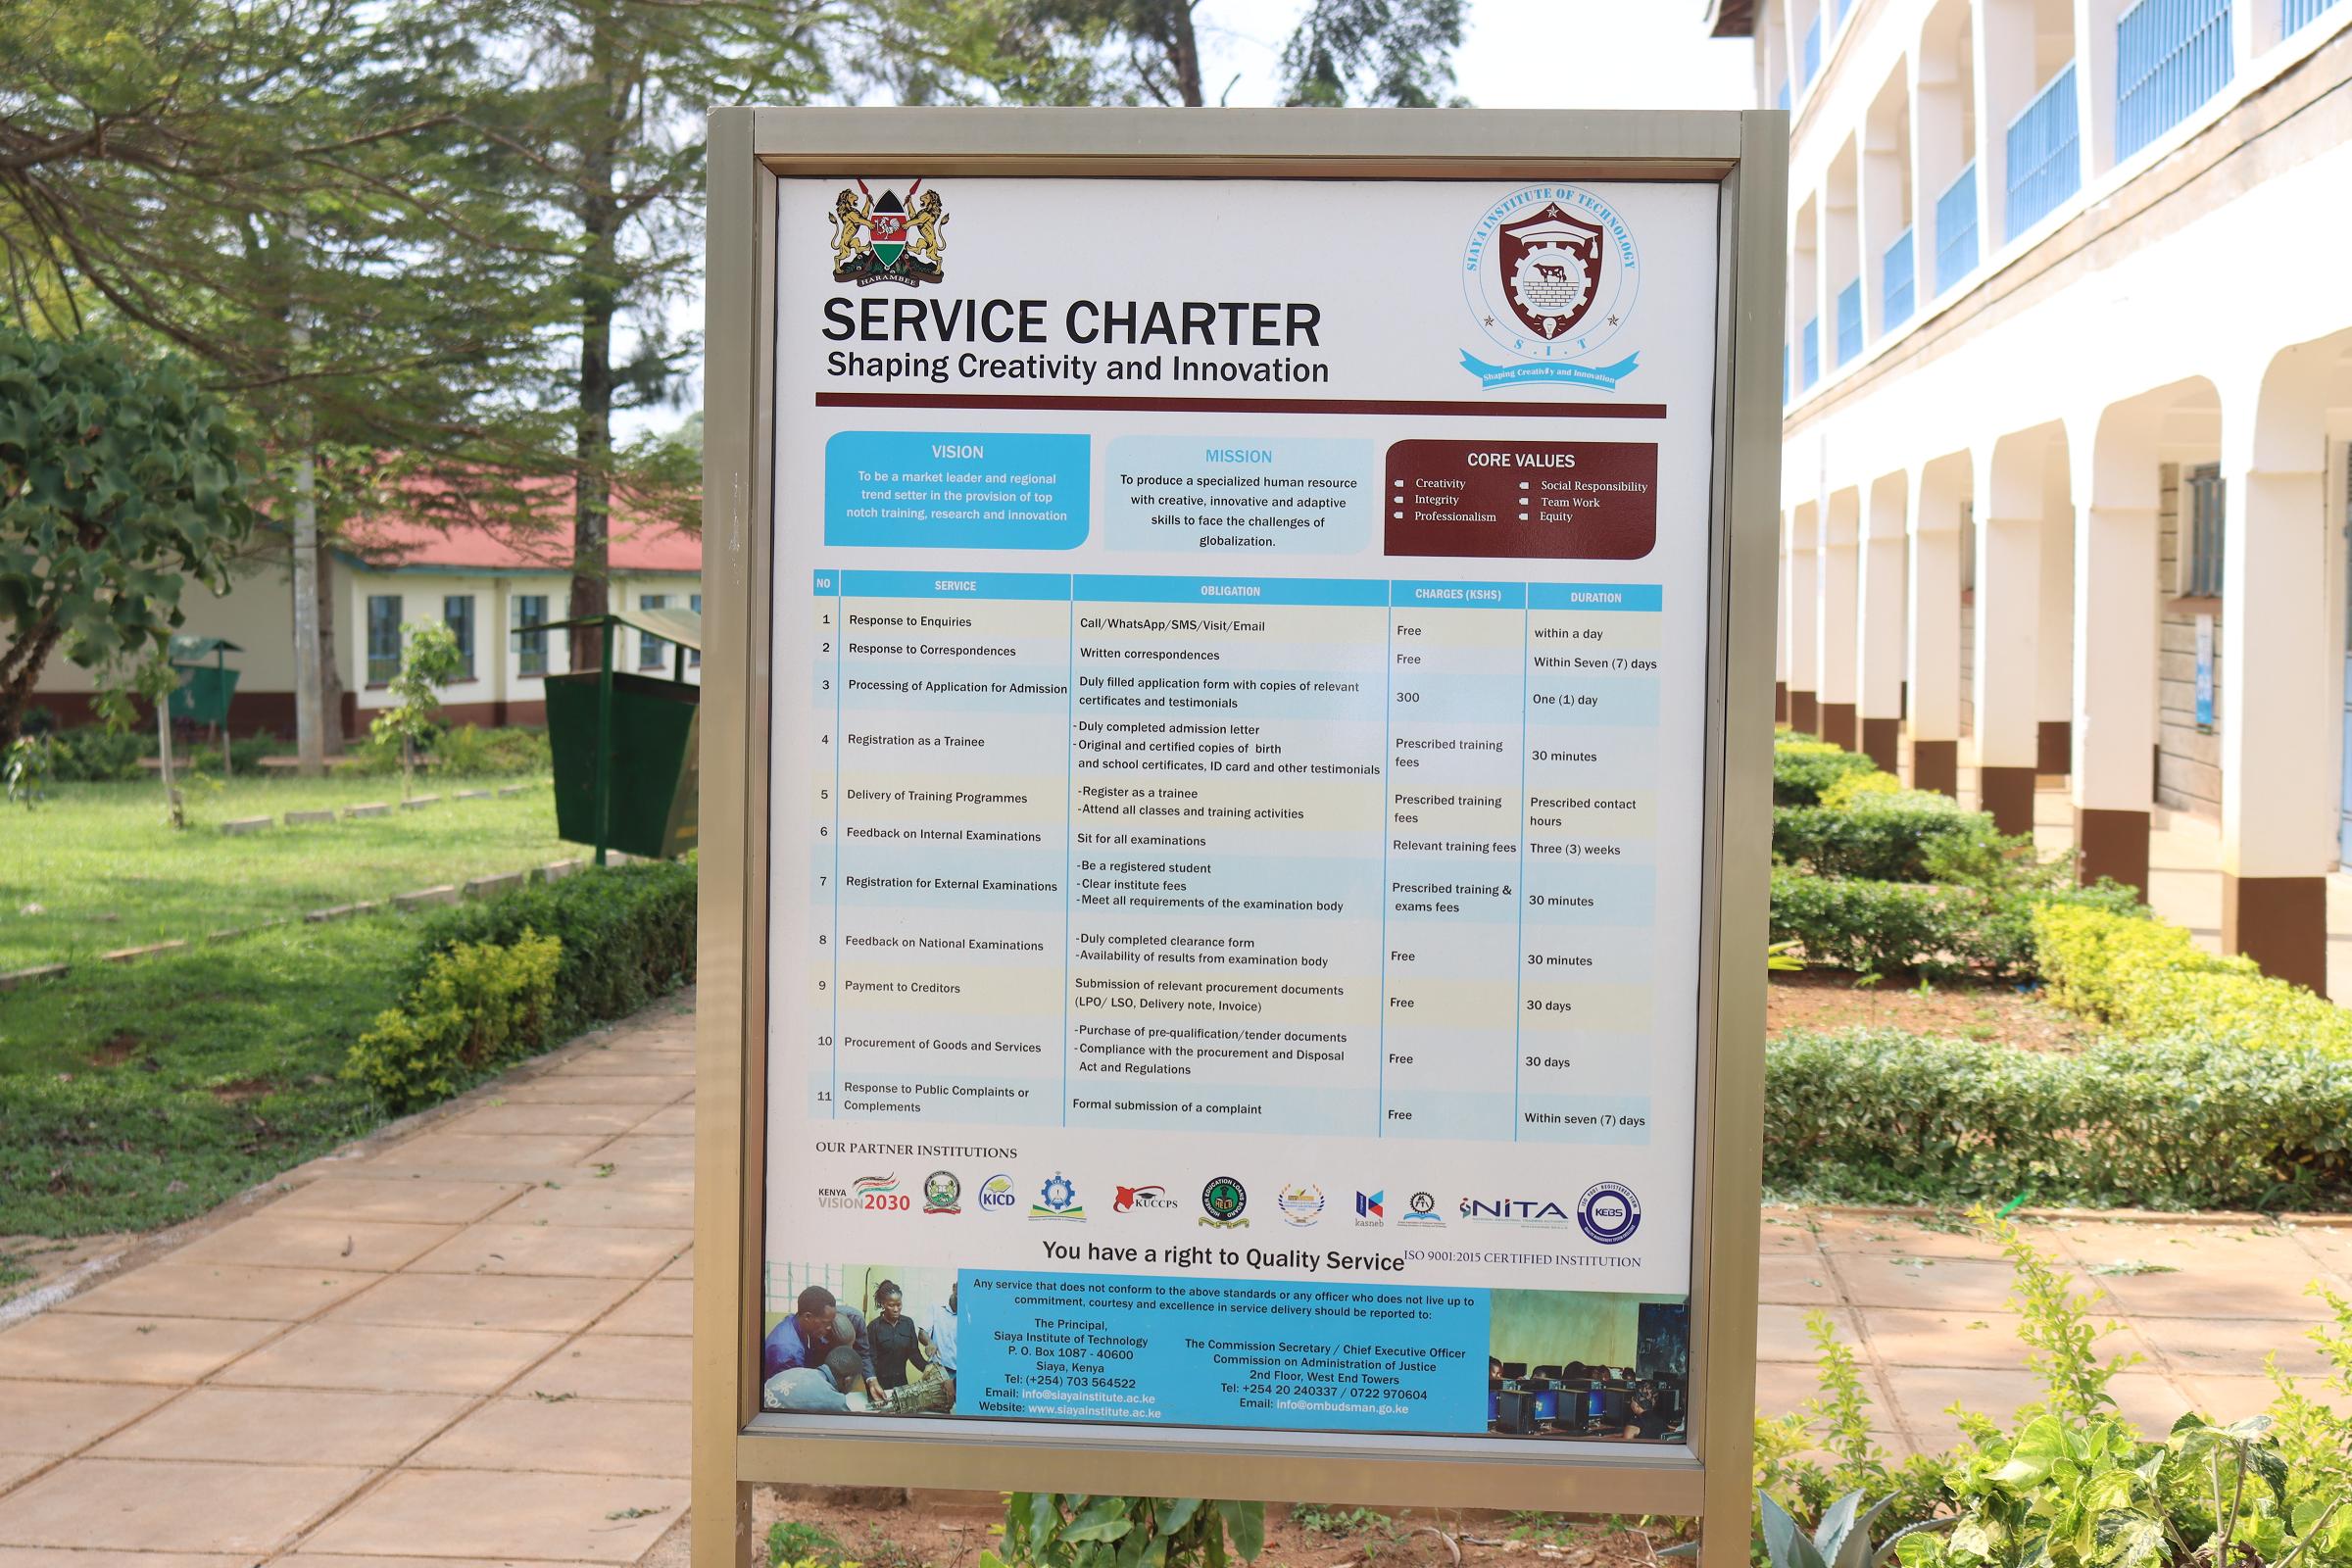 SIT Service Charter